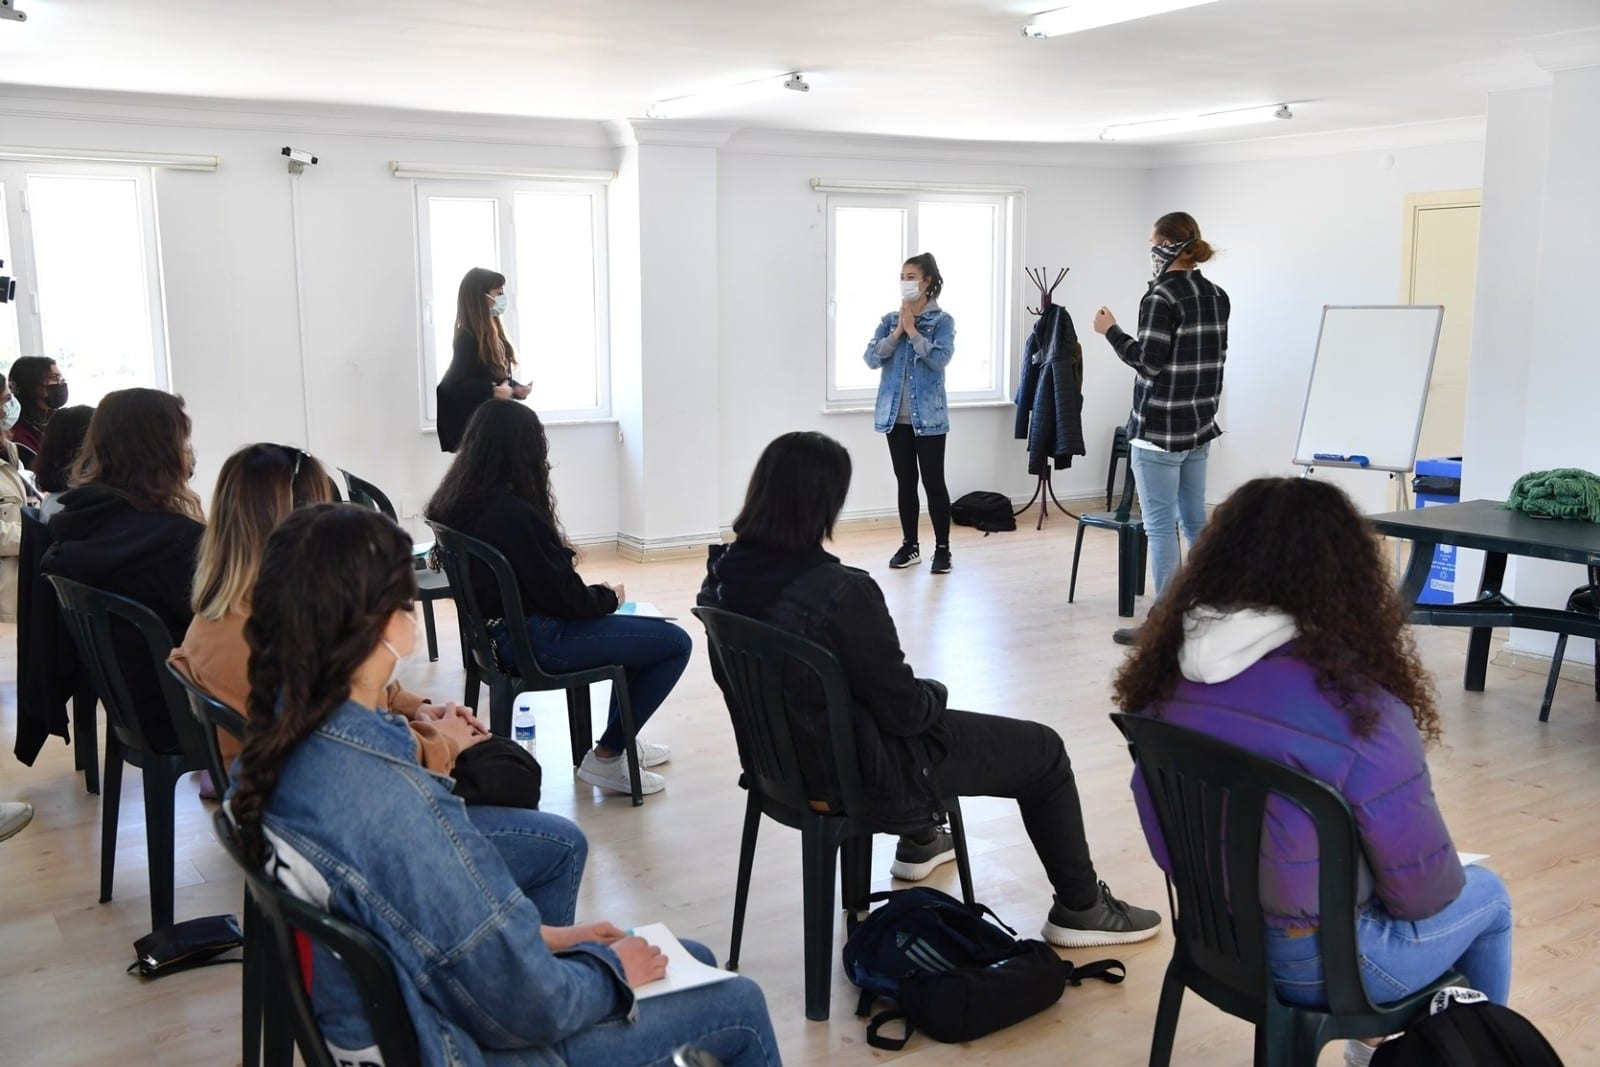 konyaalti belediyesinden ucretsiz tiyatro egitimi 1 NahHdgin